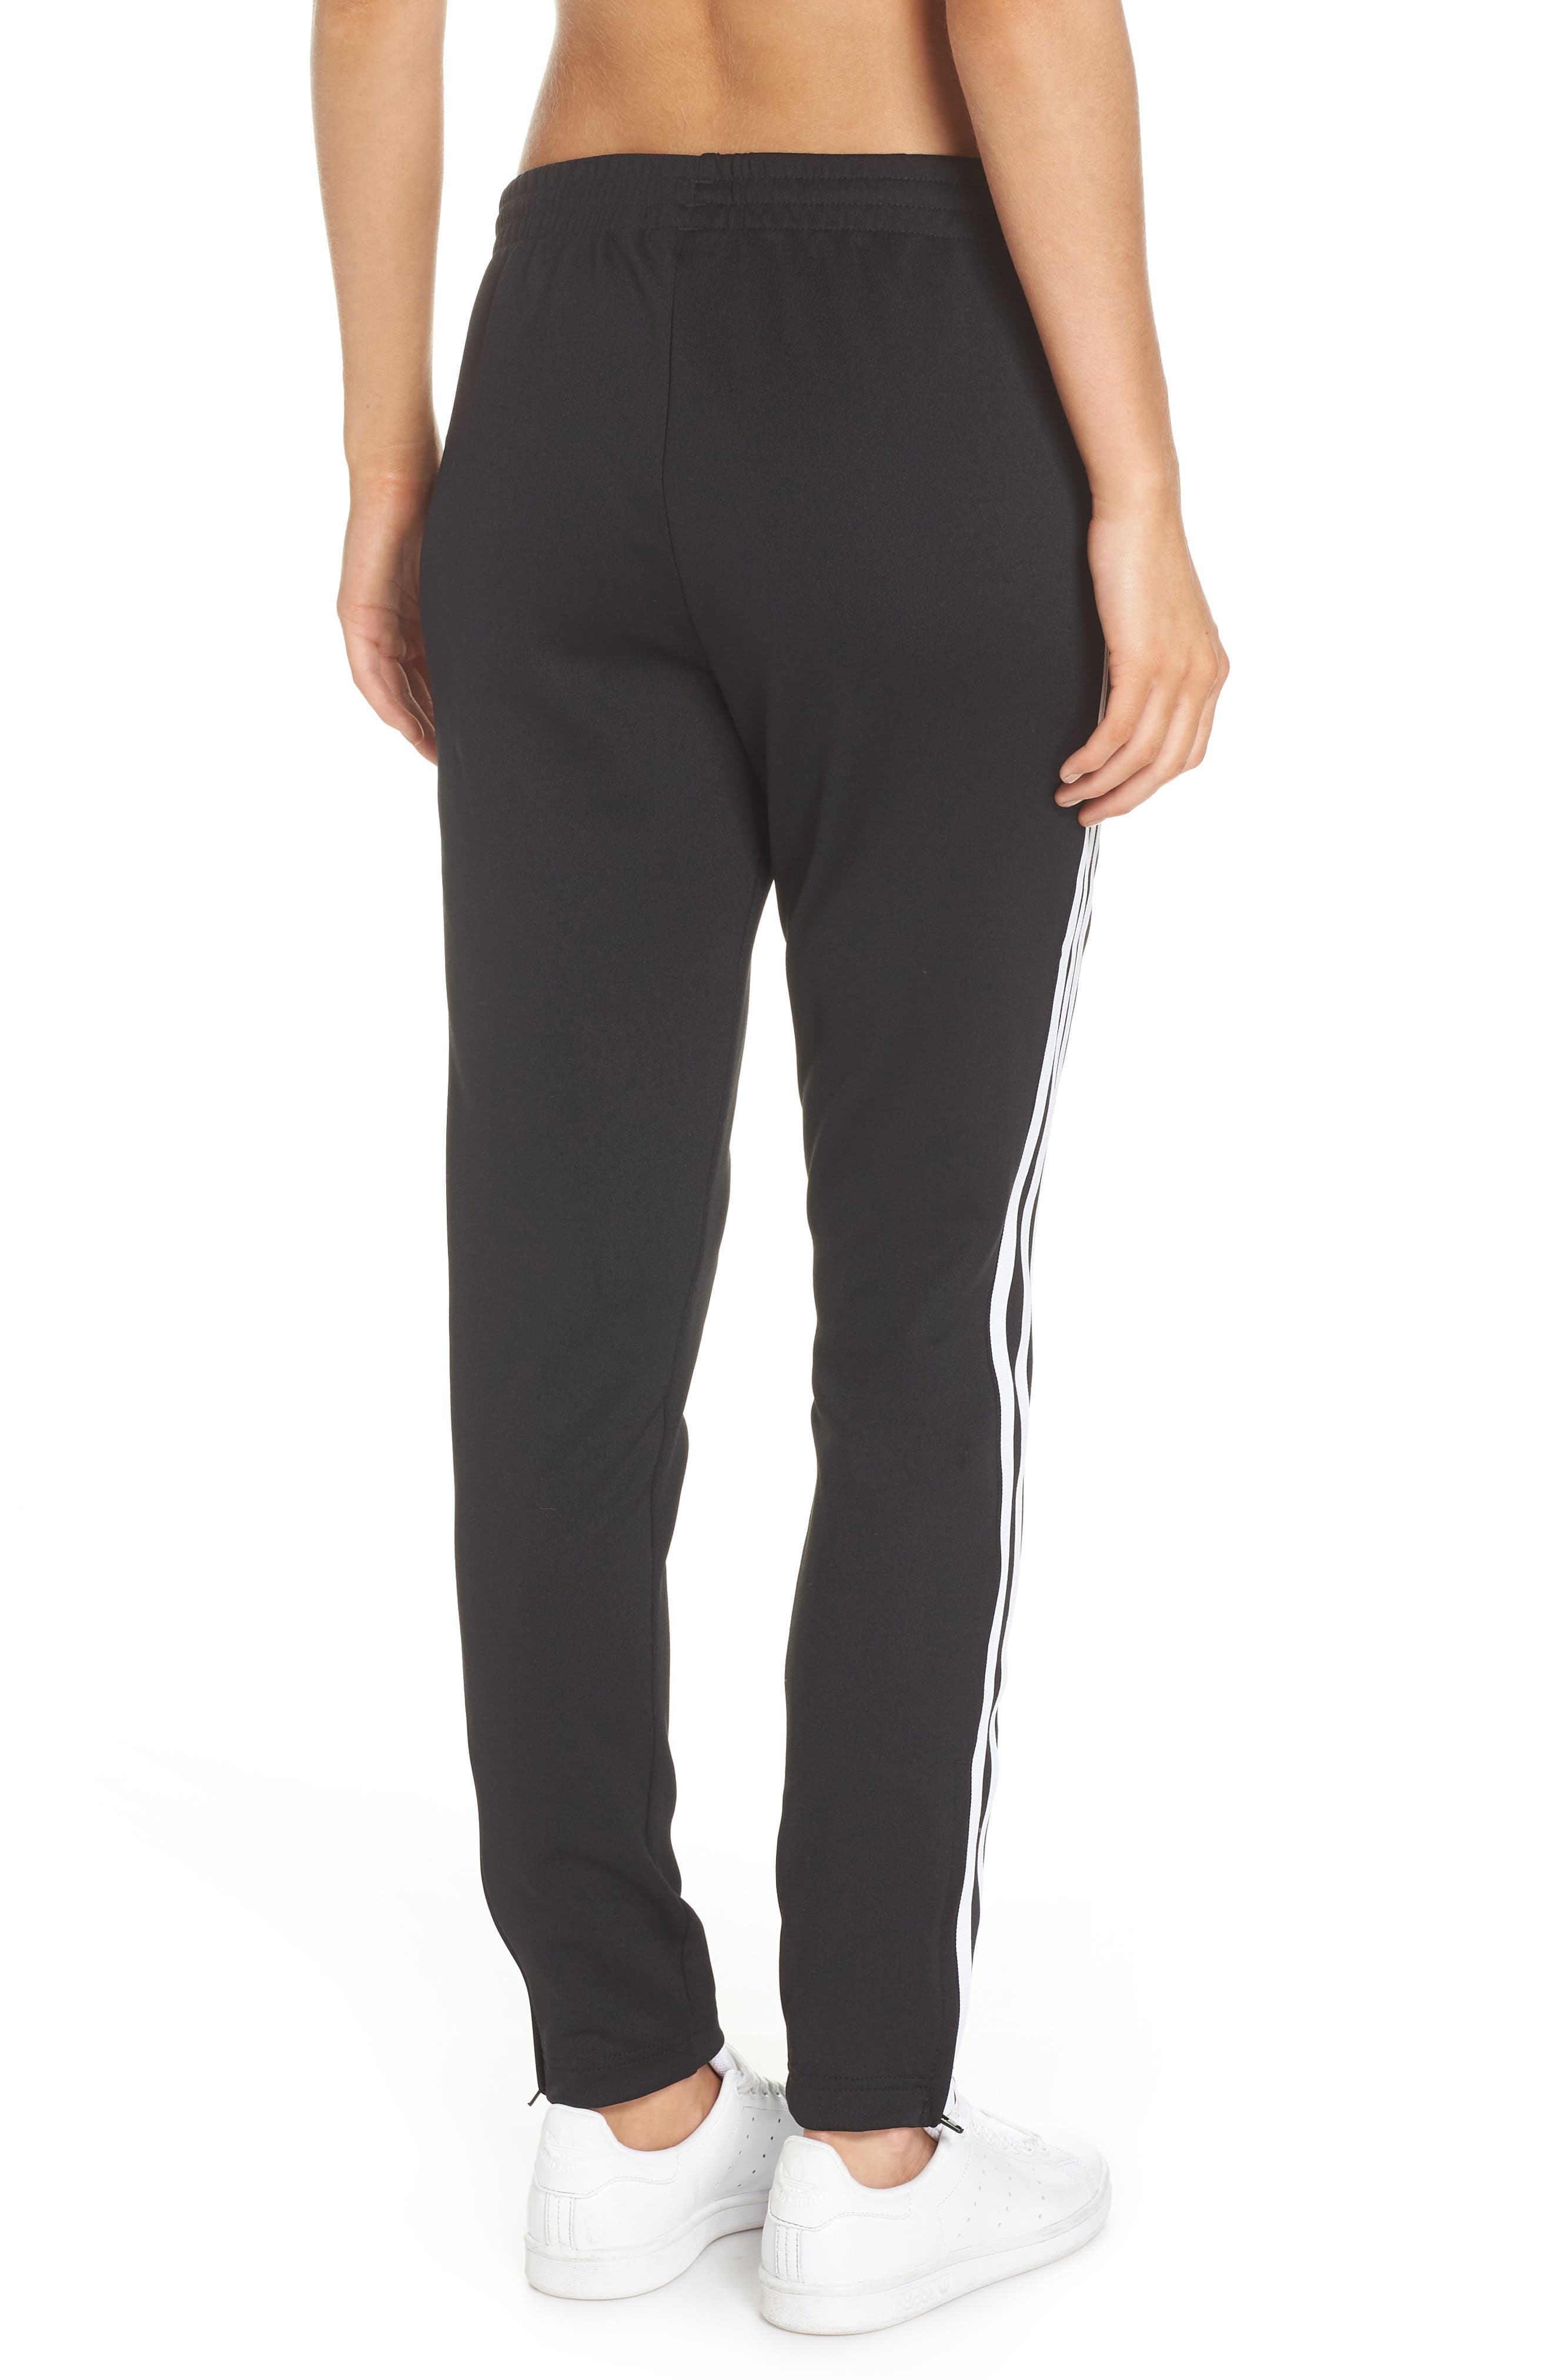 SST Track Pants,                             Alternate thumbnail 2, color,                             BLACK